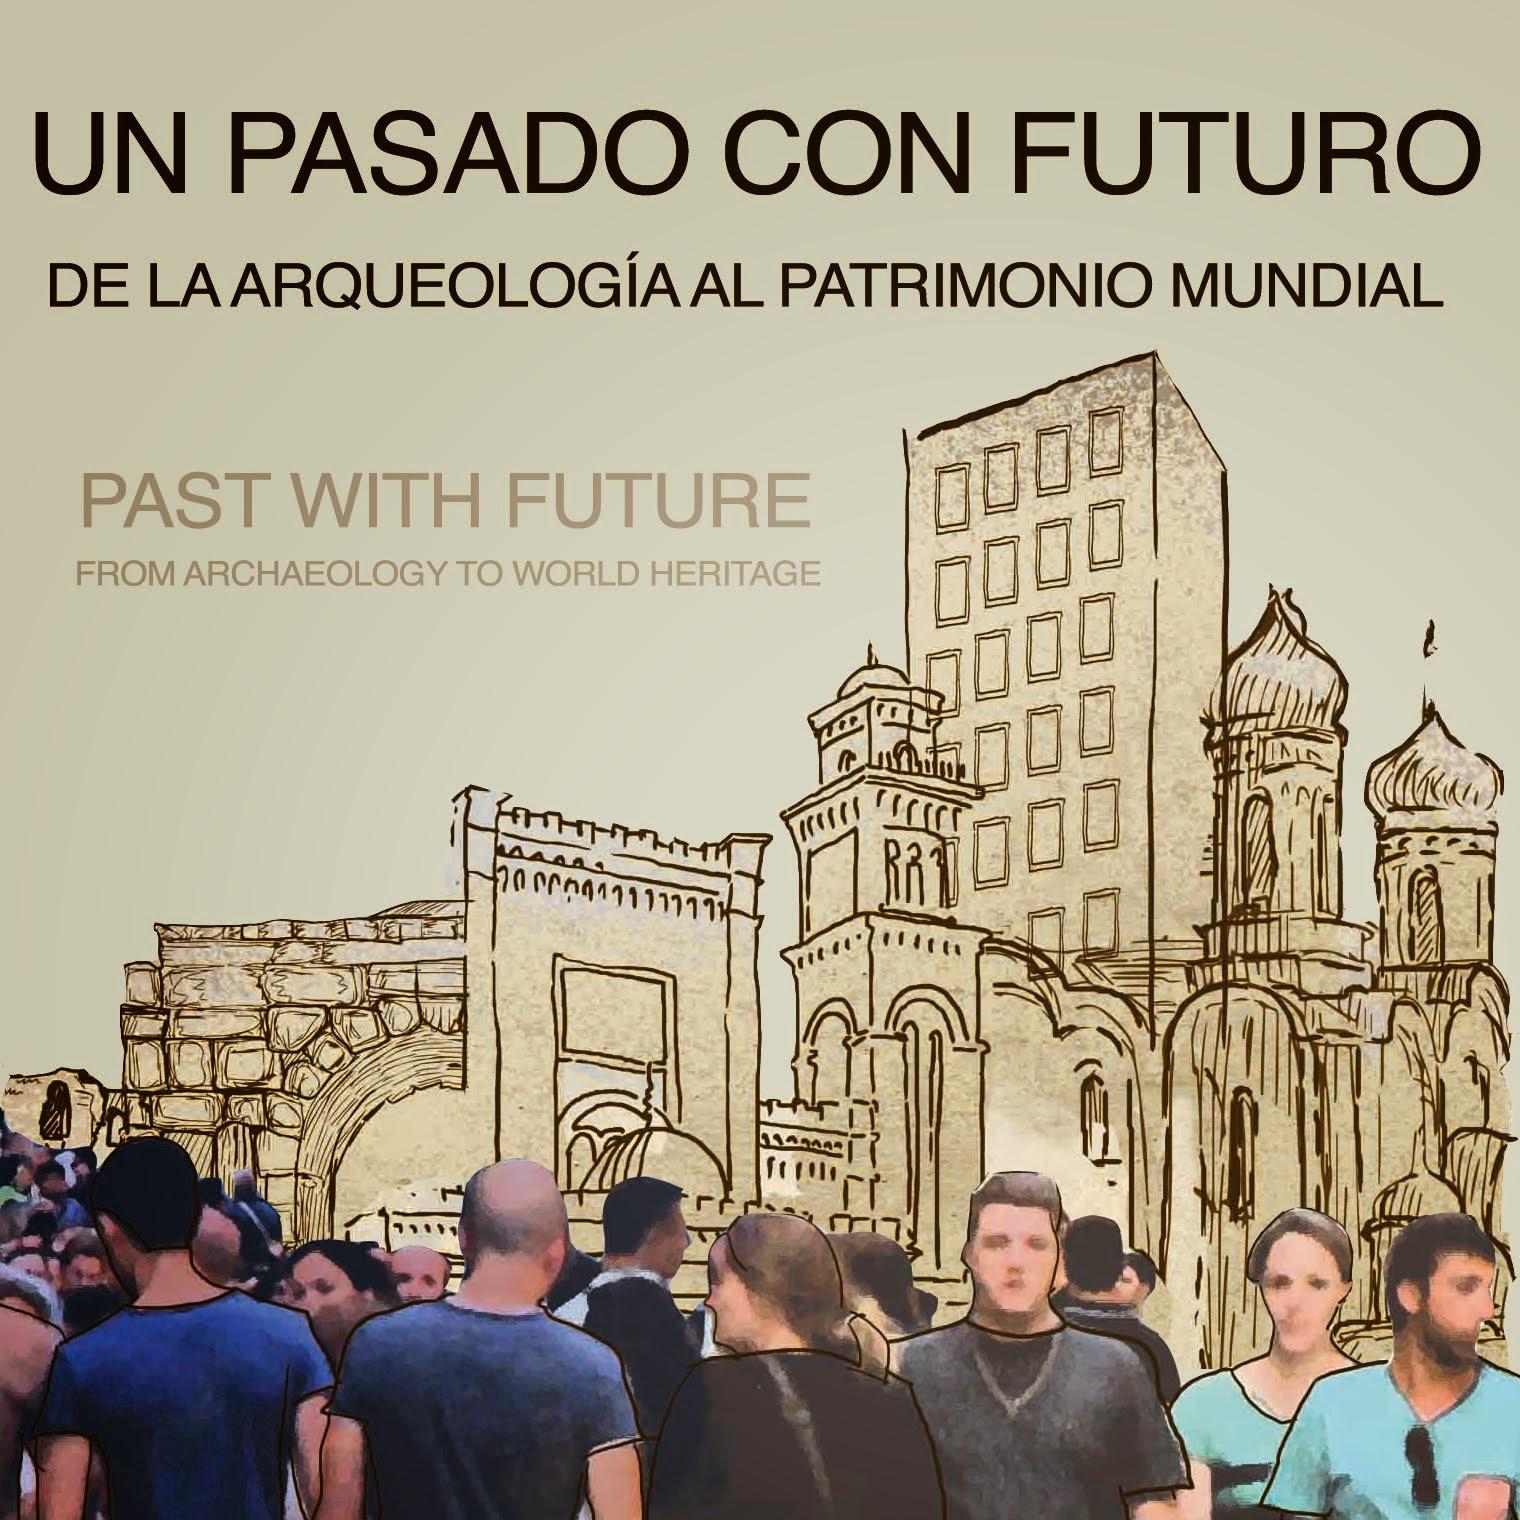 Un pasado con futuro